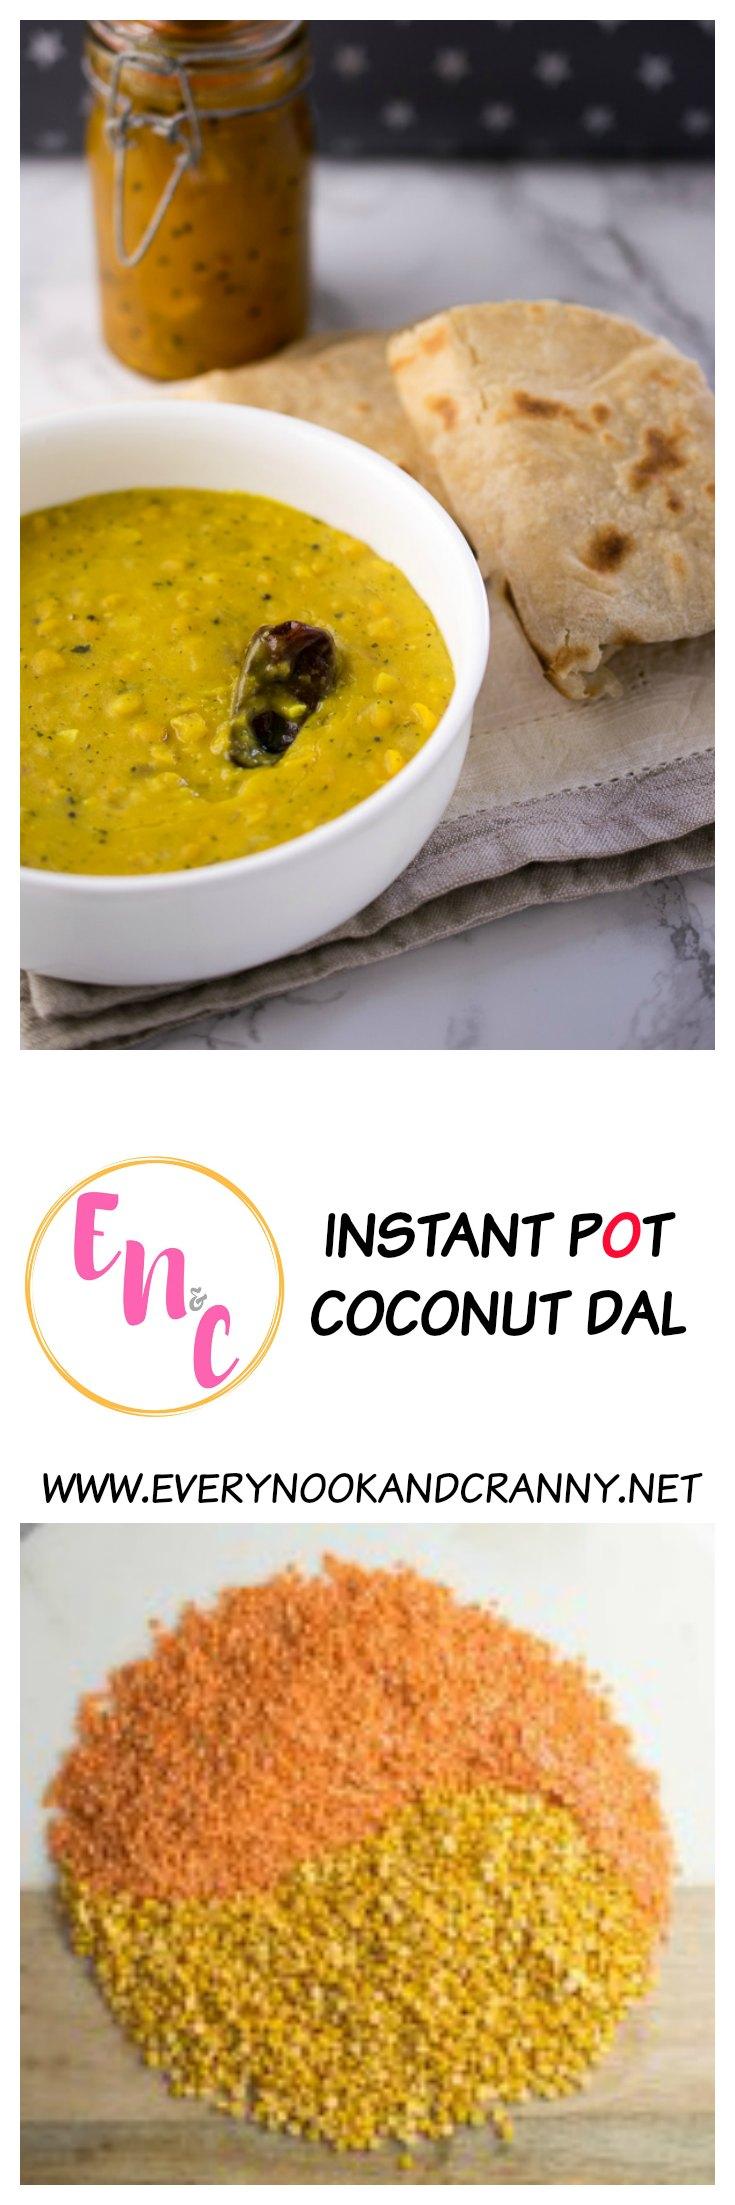 Instant Pot Coconut Dal